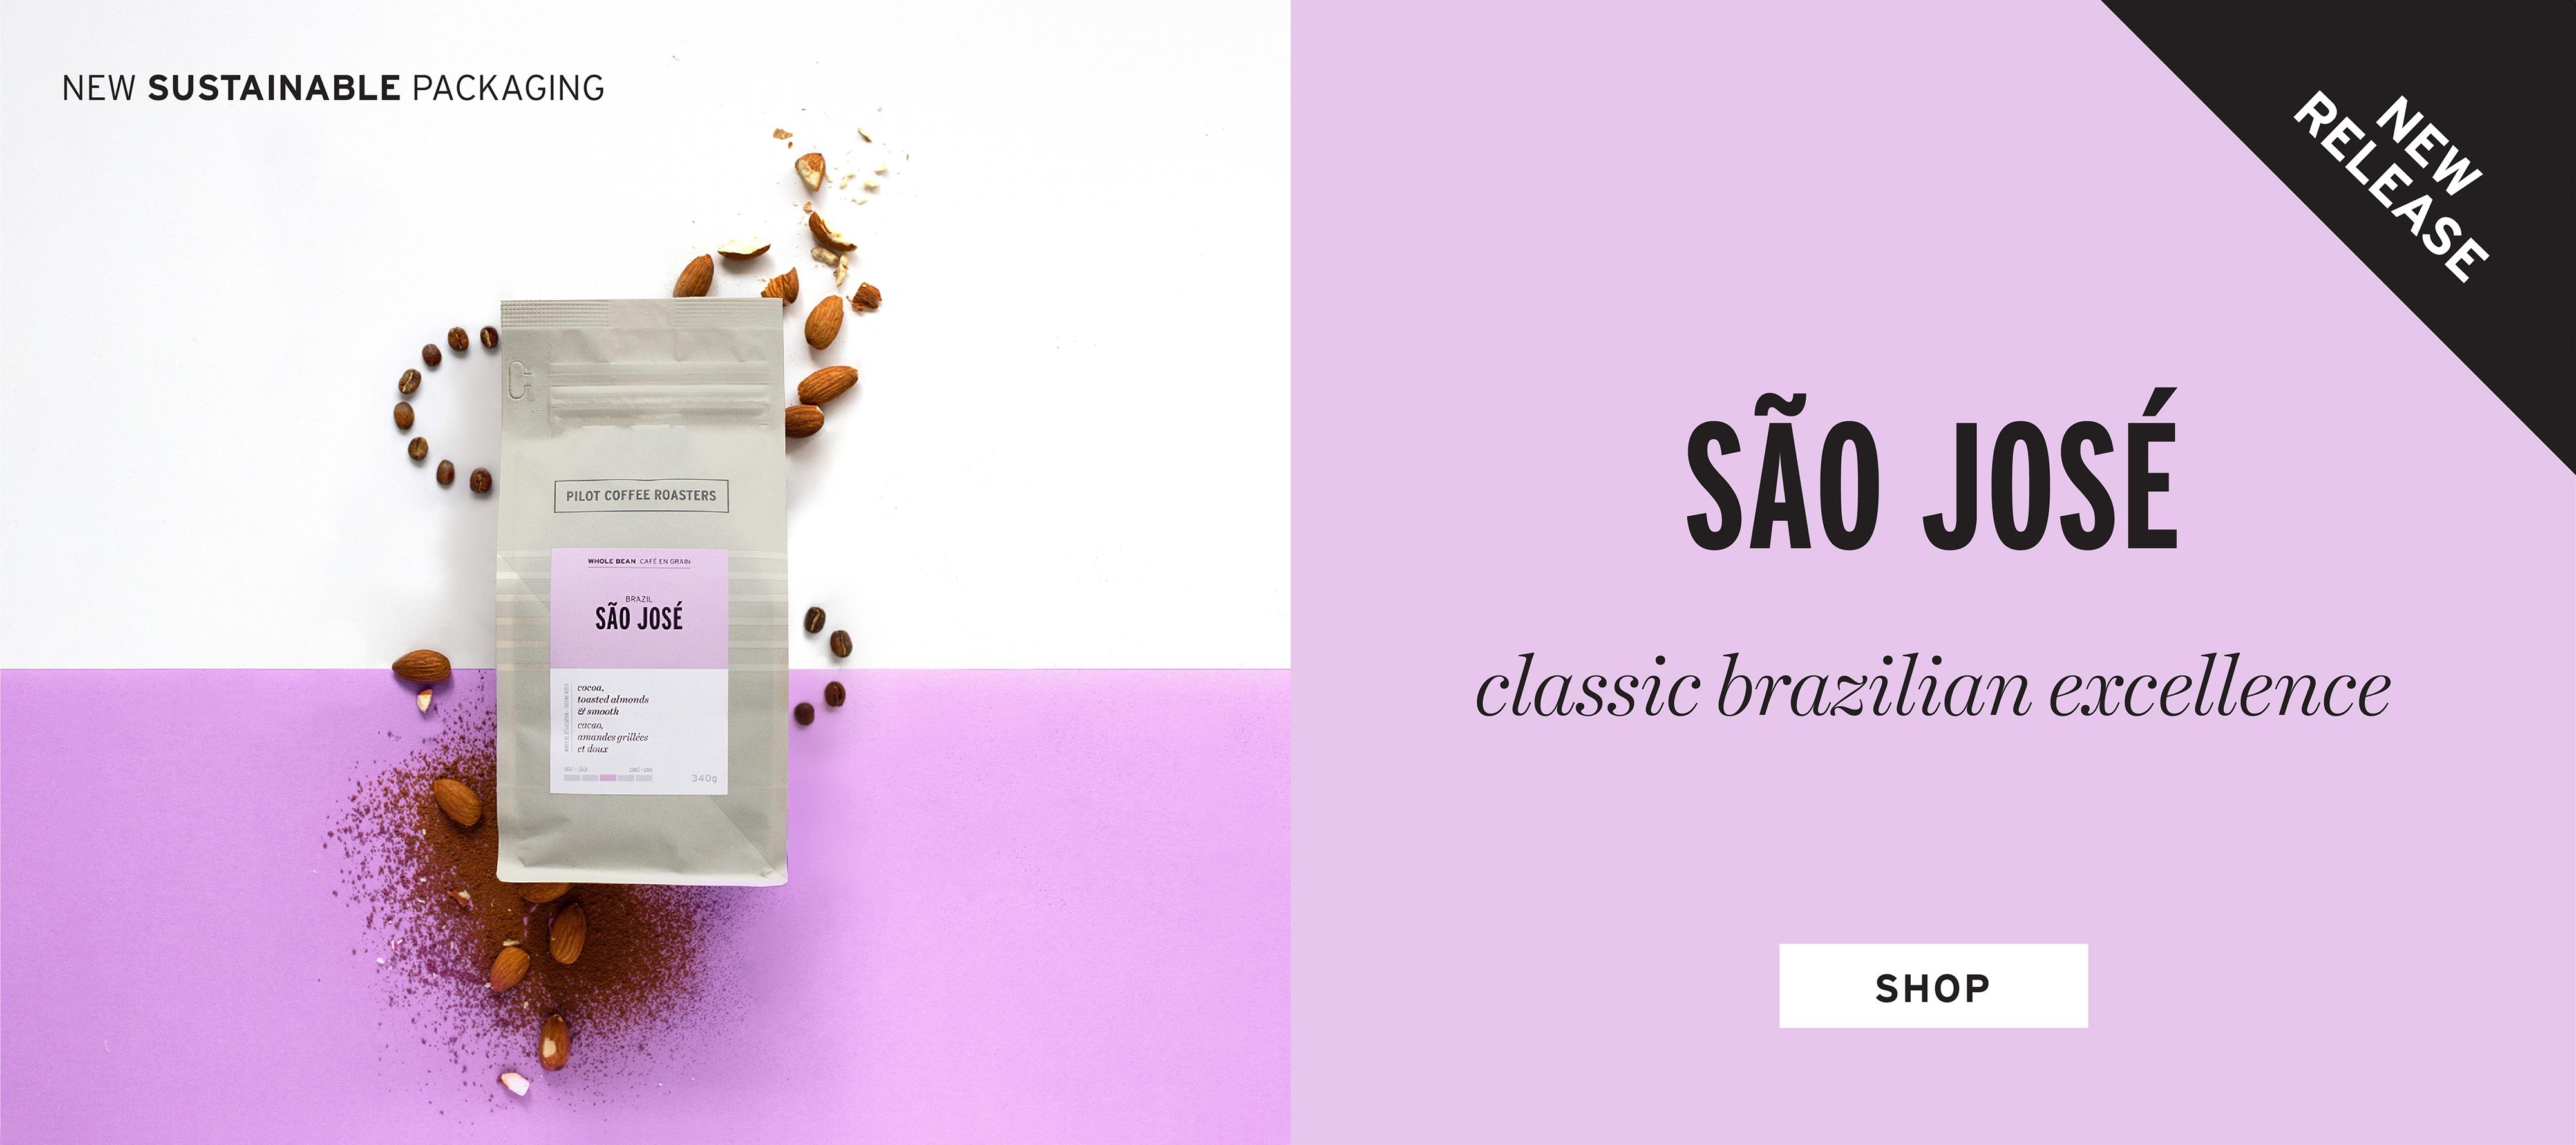 New release Sao Jose single origin coffee from Brazil